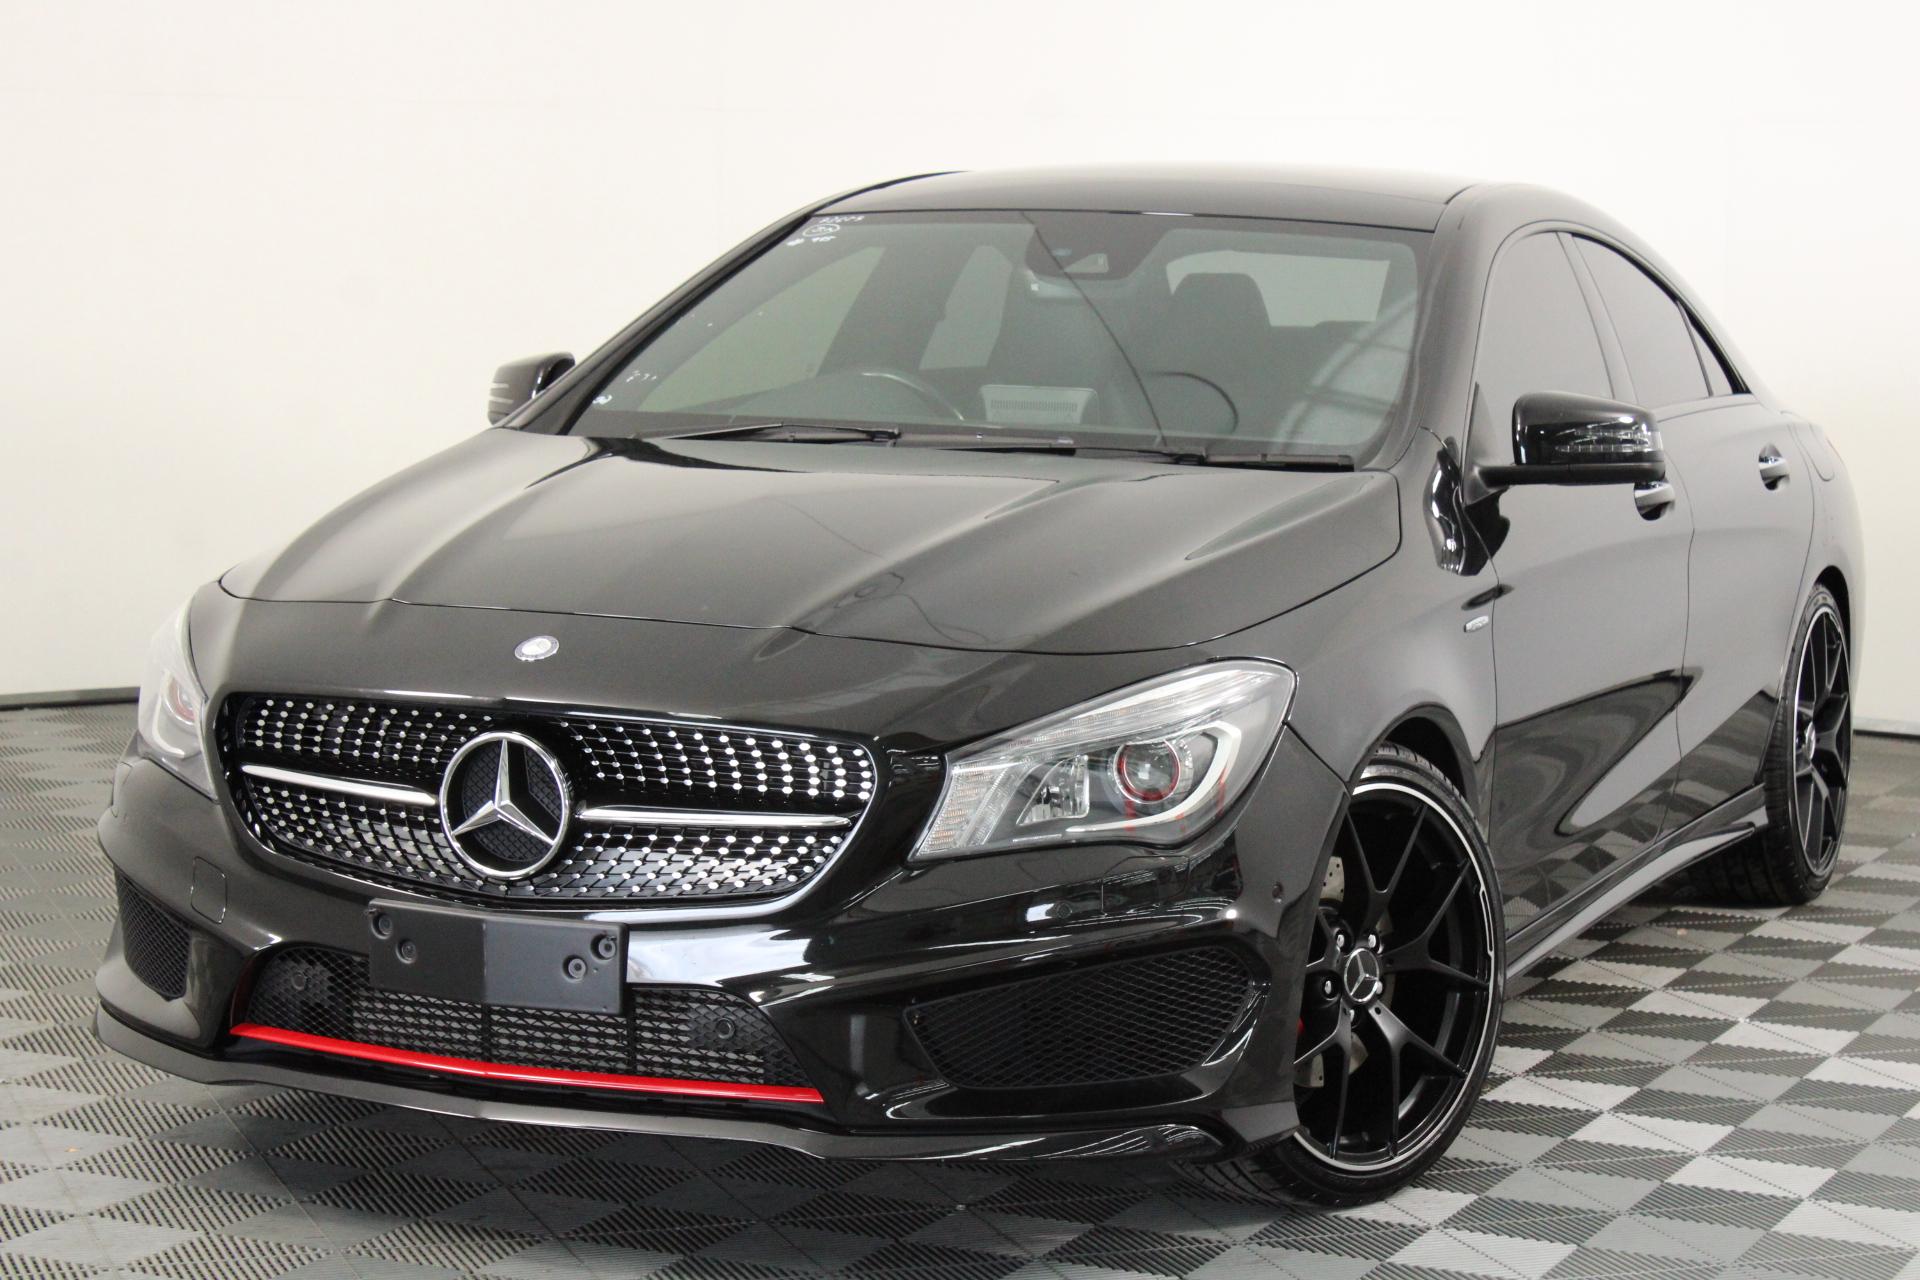 2016 Mercedes Benz CLA Class CLA250 SPORT 4MATIC C117 Automatic Coupe